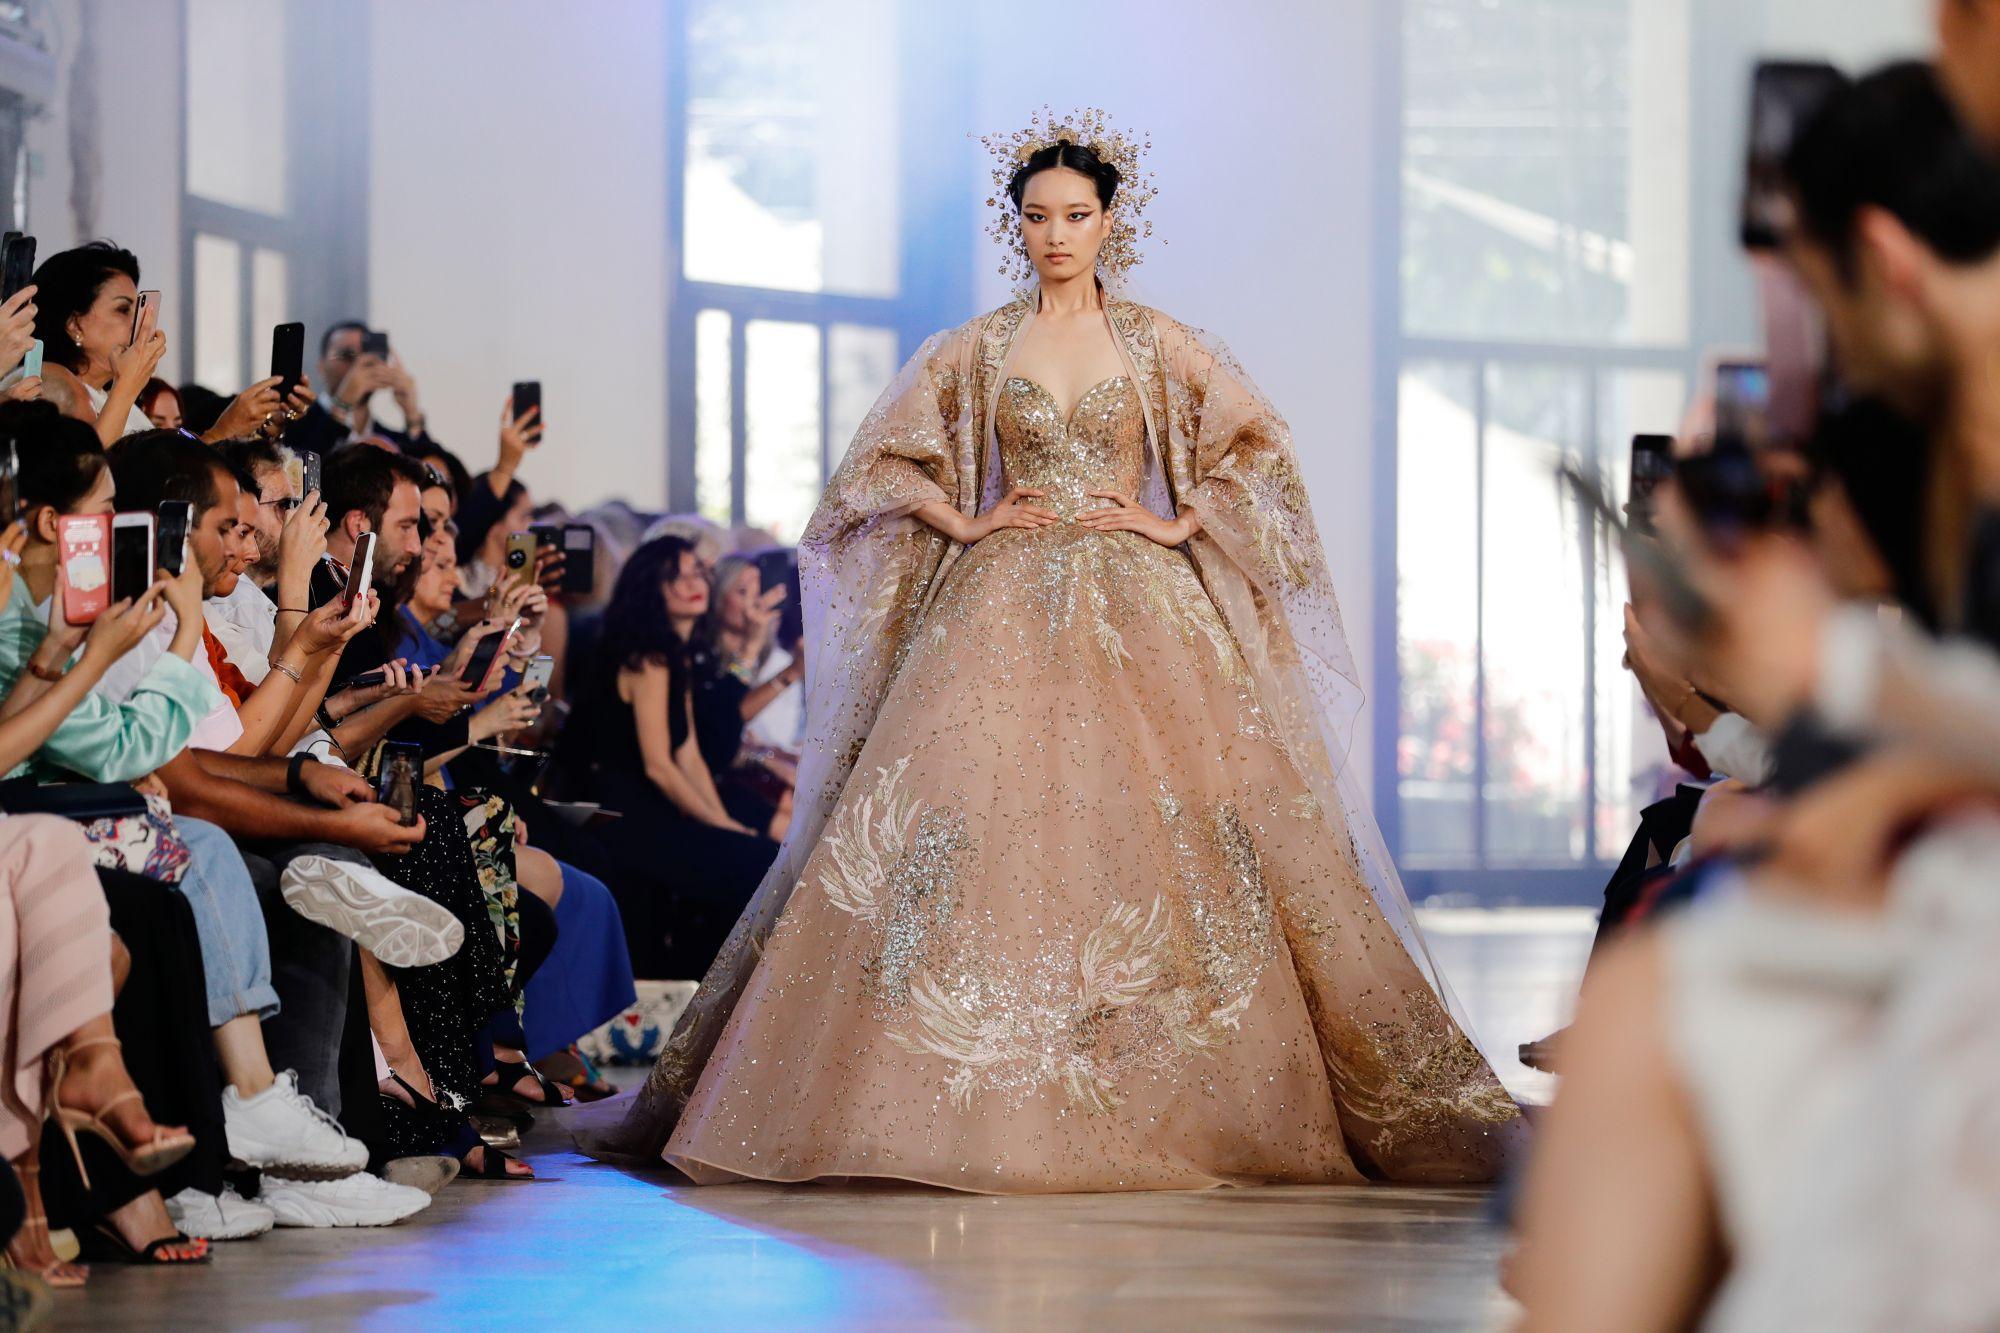 Elie Saab Haute Couture Fall/Winter 2019 (Image: Thomas Samson/AFP)